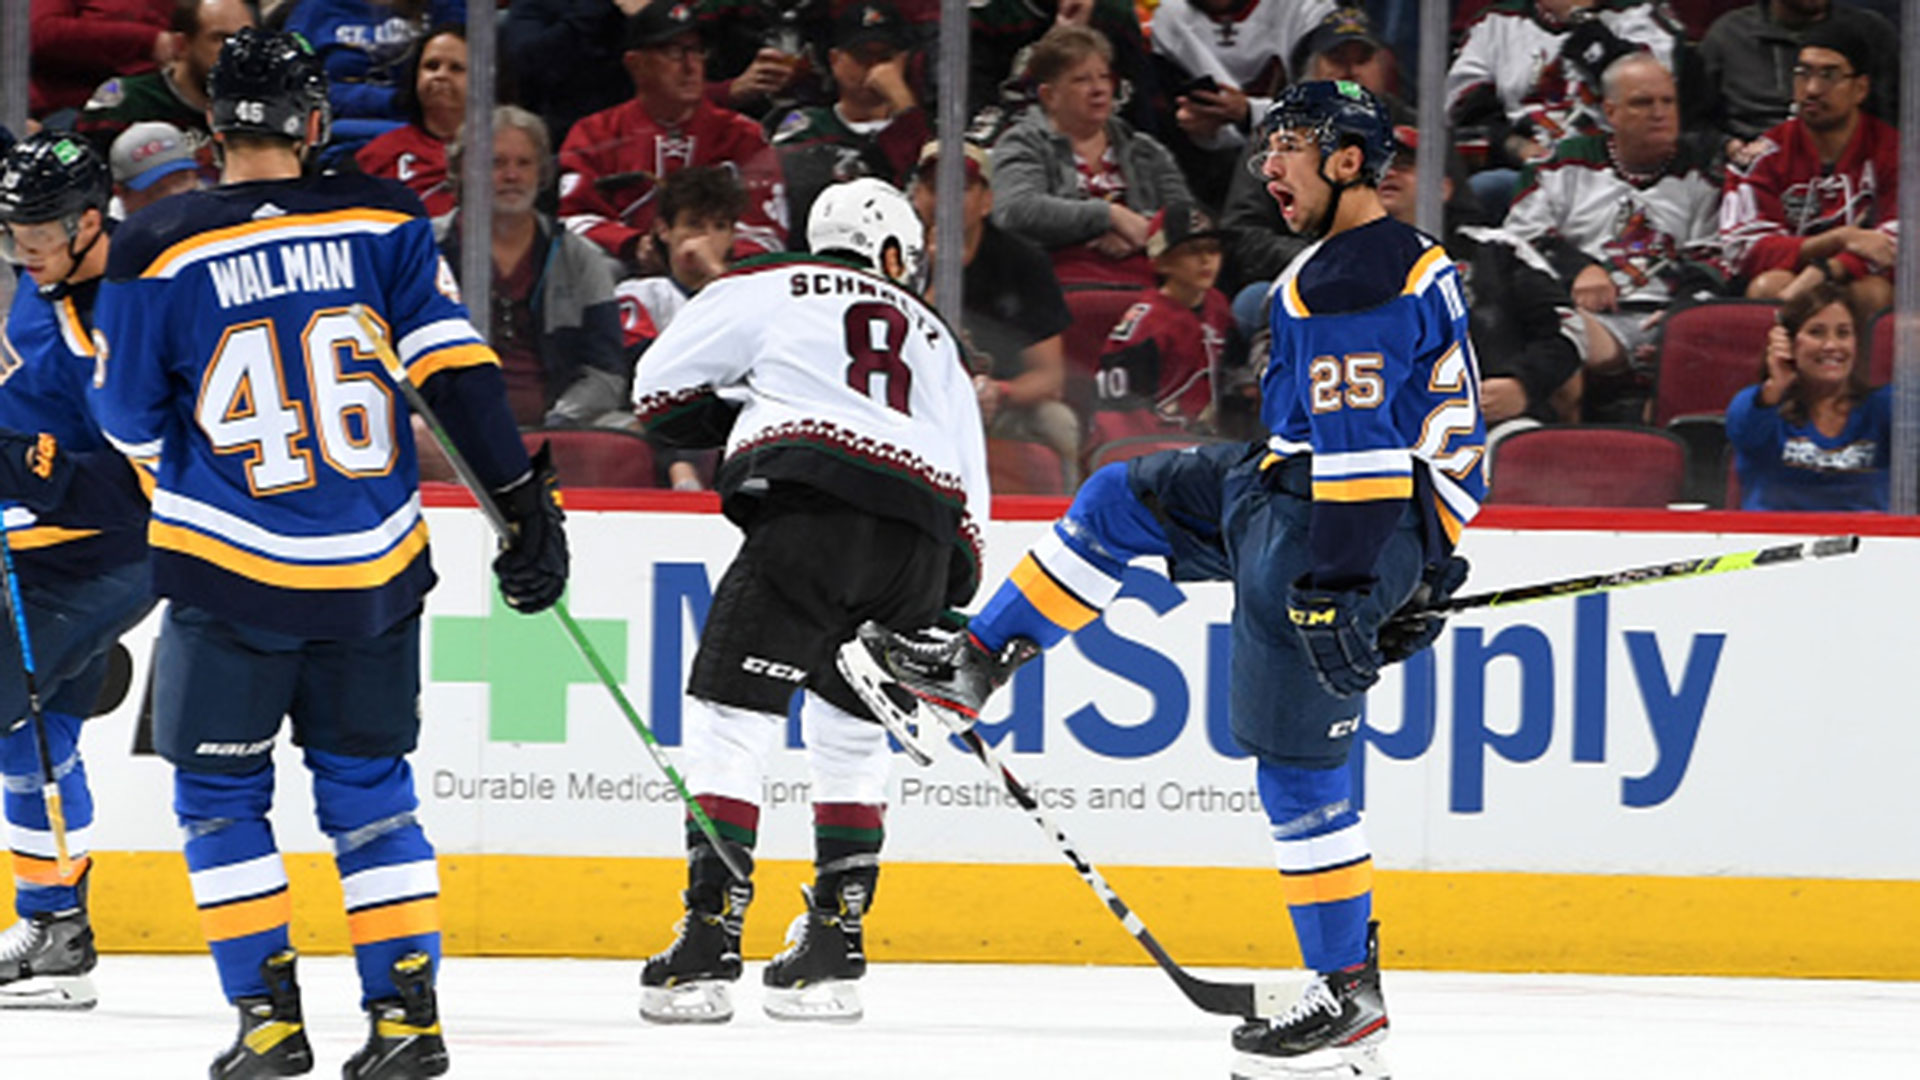 NHL: Blues 7, Coyotes 4